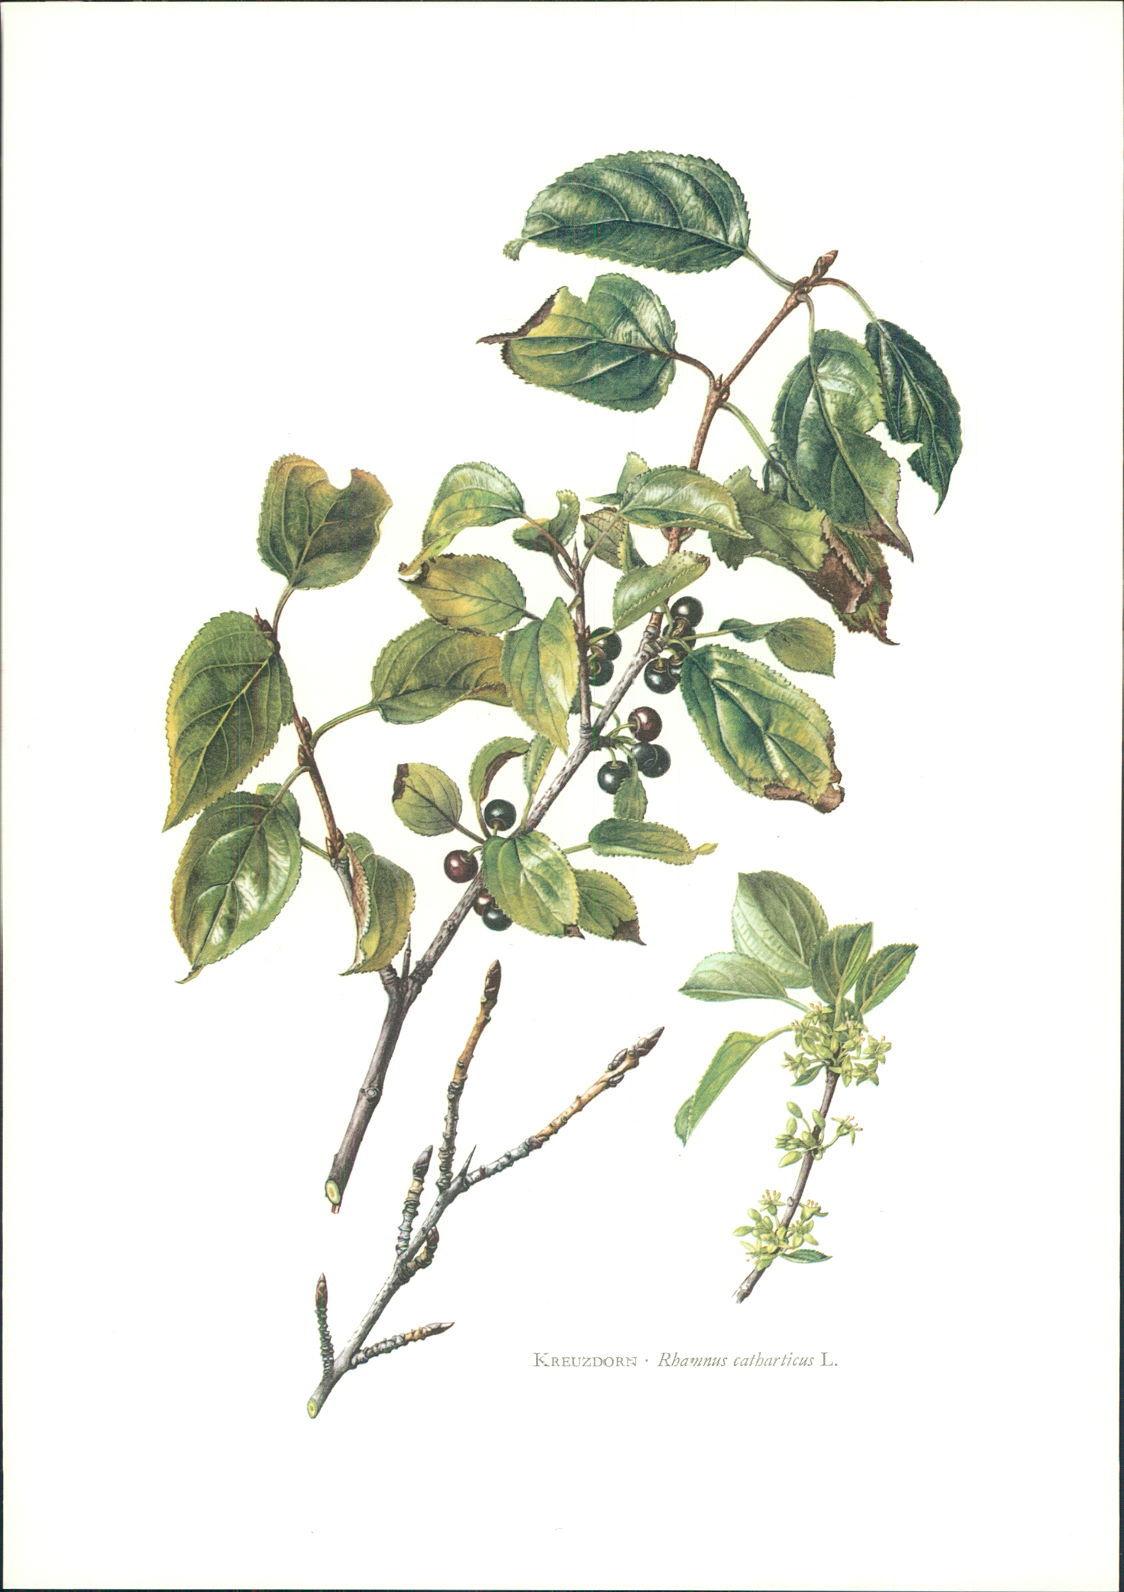 Druck. Kreuzdorn - Rhamnus catharticus L. Claus Caspari. Offset-Lithographie.